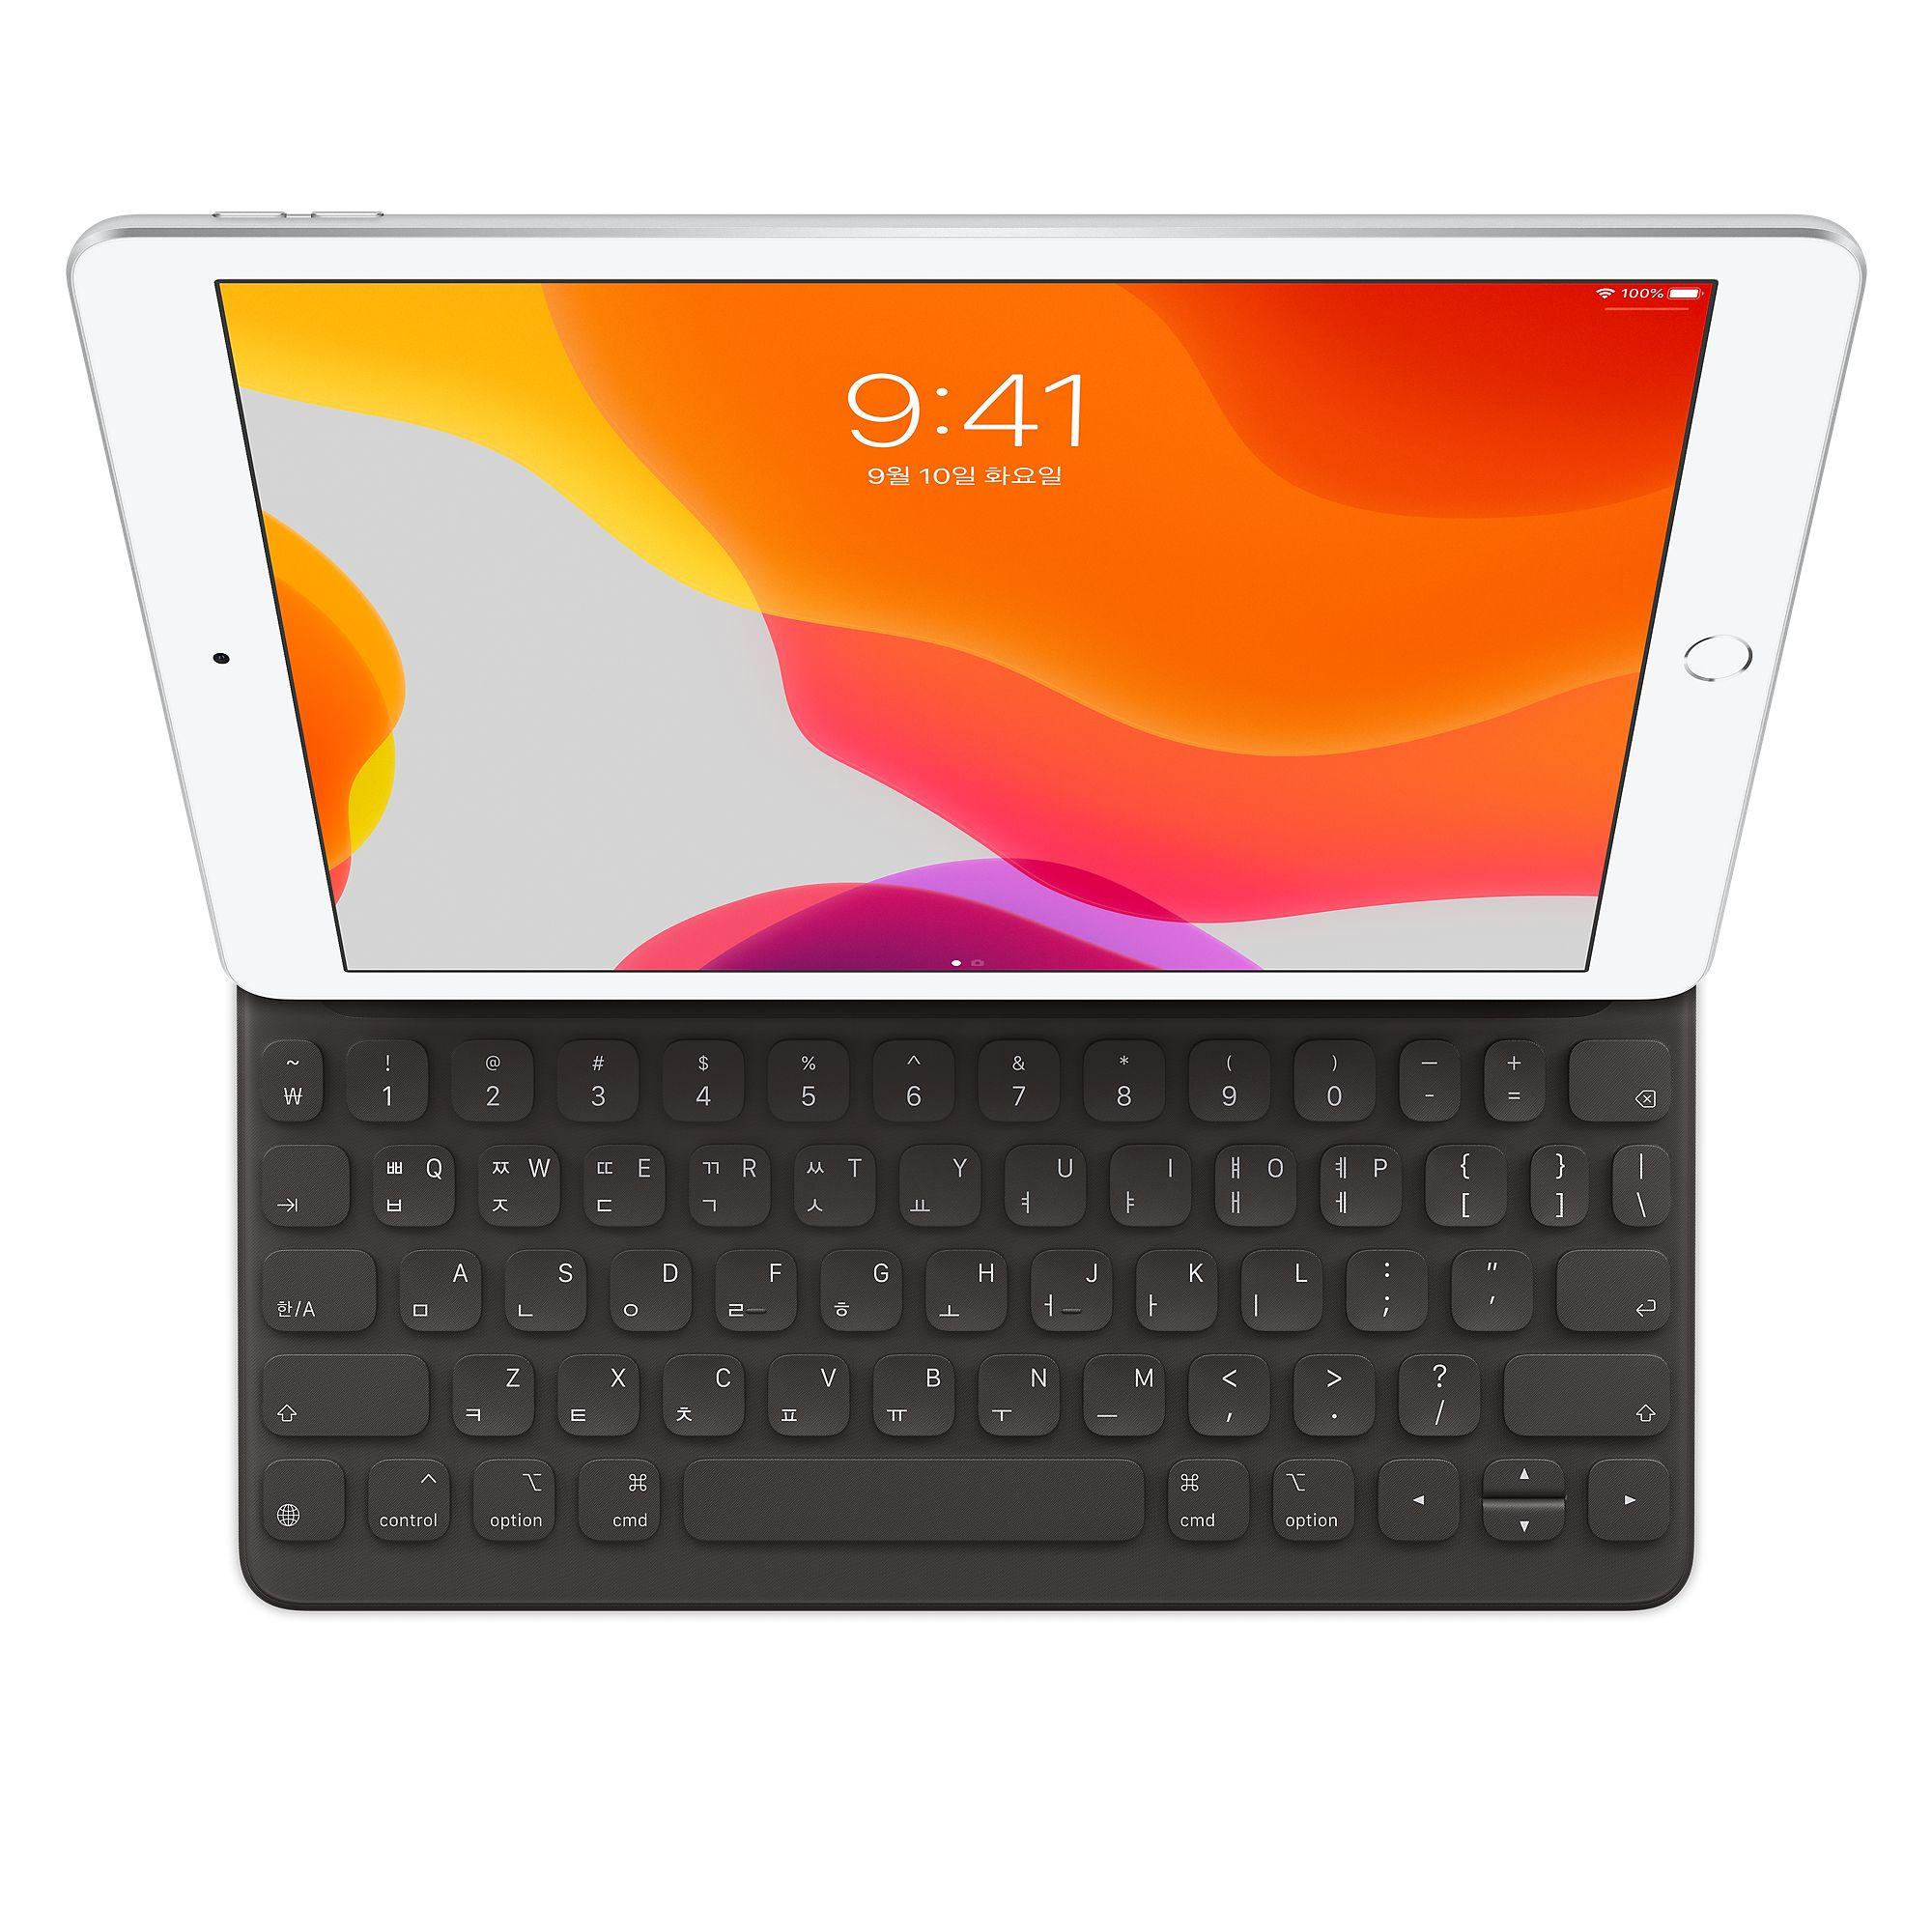 Apple 정품 Smart Keyboard, 한글 자판